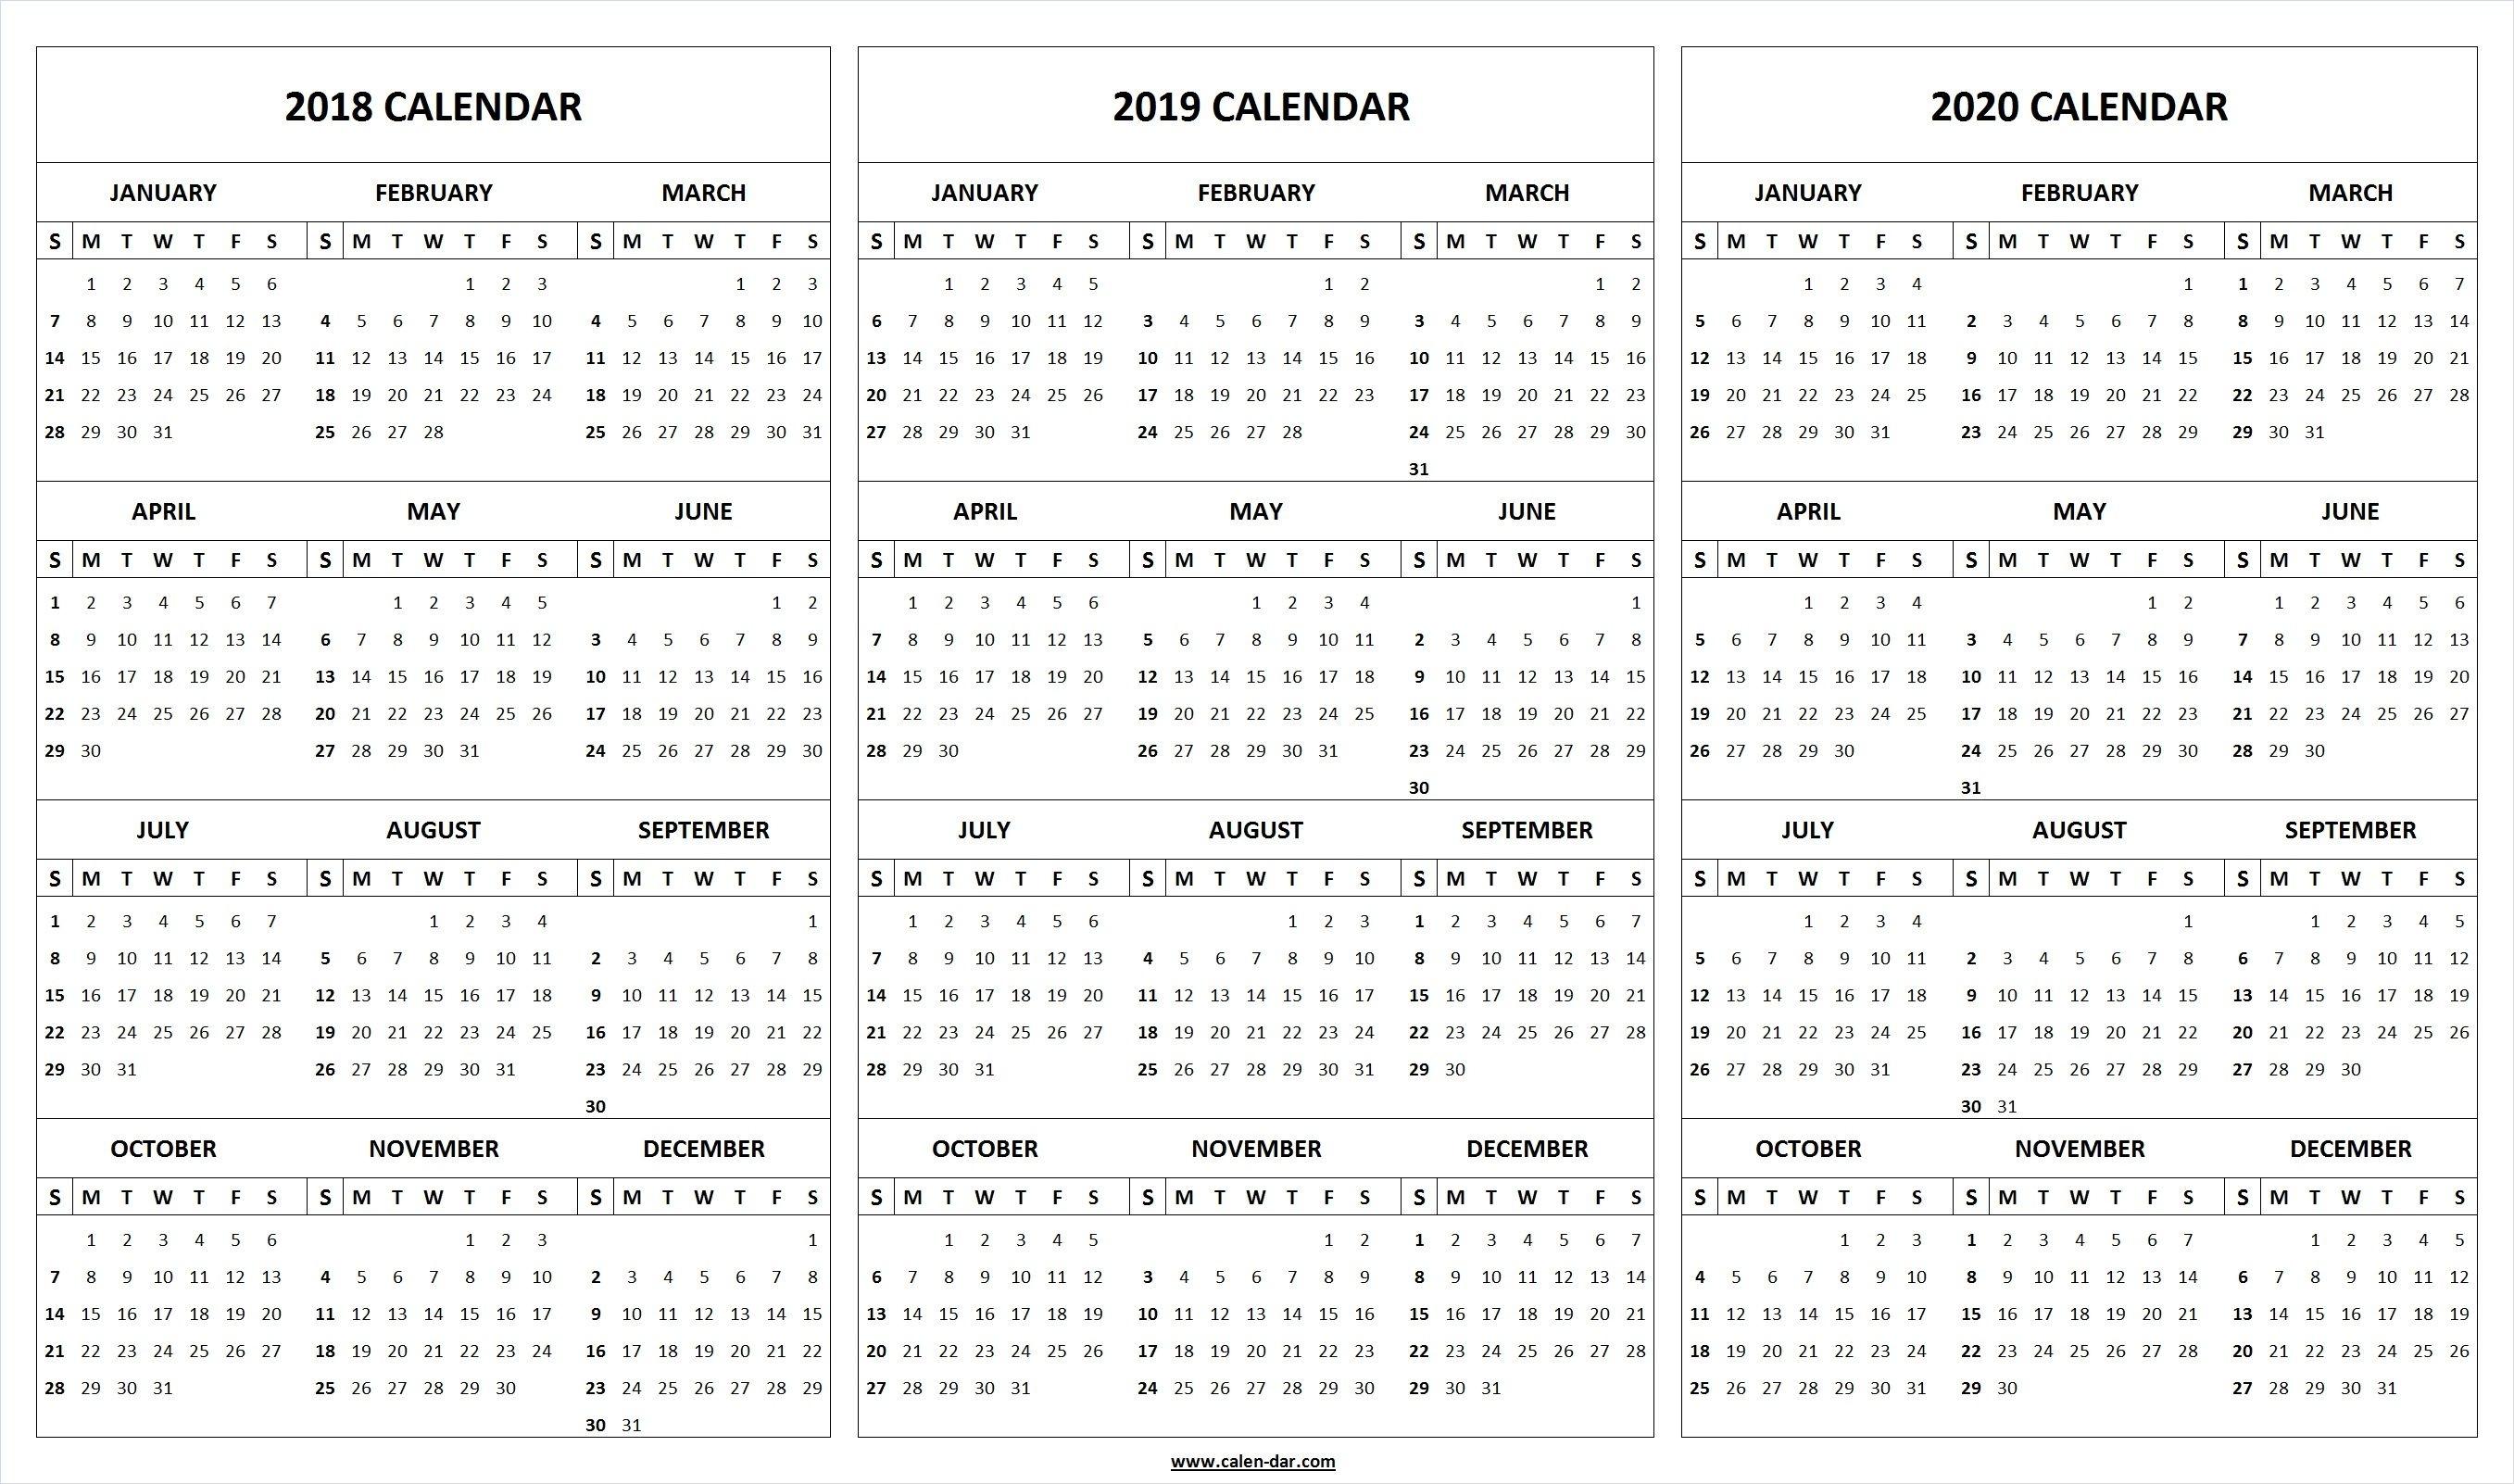 Print Blank 2018 2019 2020 Calendar Template | 2021 Calendar